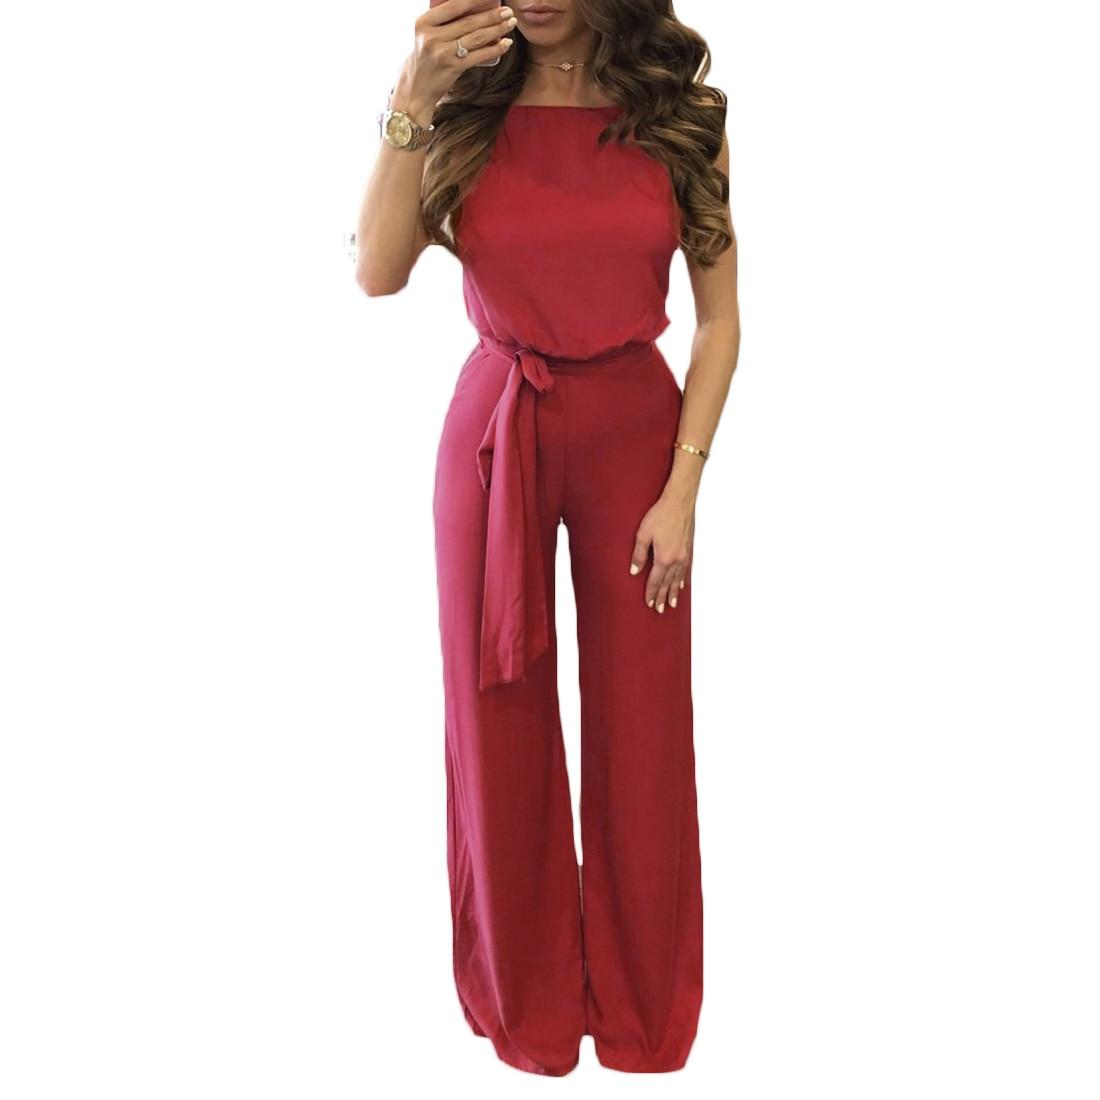 Summer Backless Office Jumpsuit Women Romper Sleeveless Long Playsuit 2017 Fashion Solid Color Burgundy Overalls Jumpsuit Femme